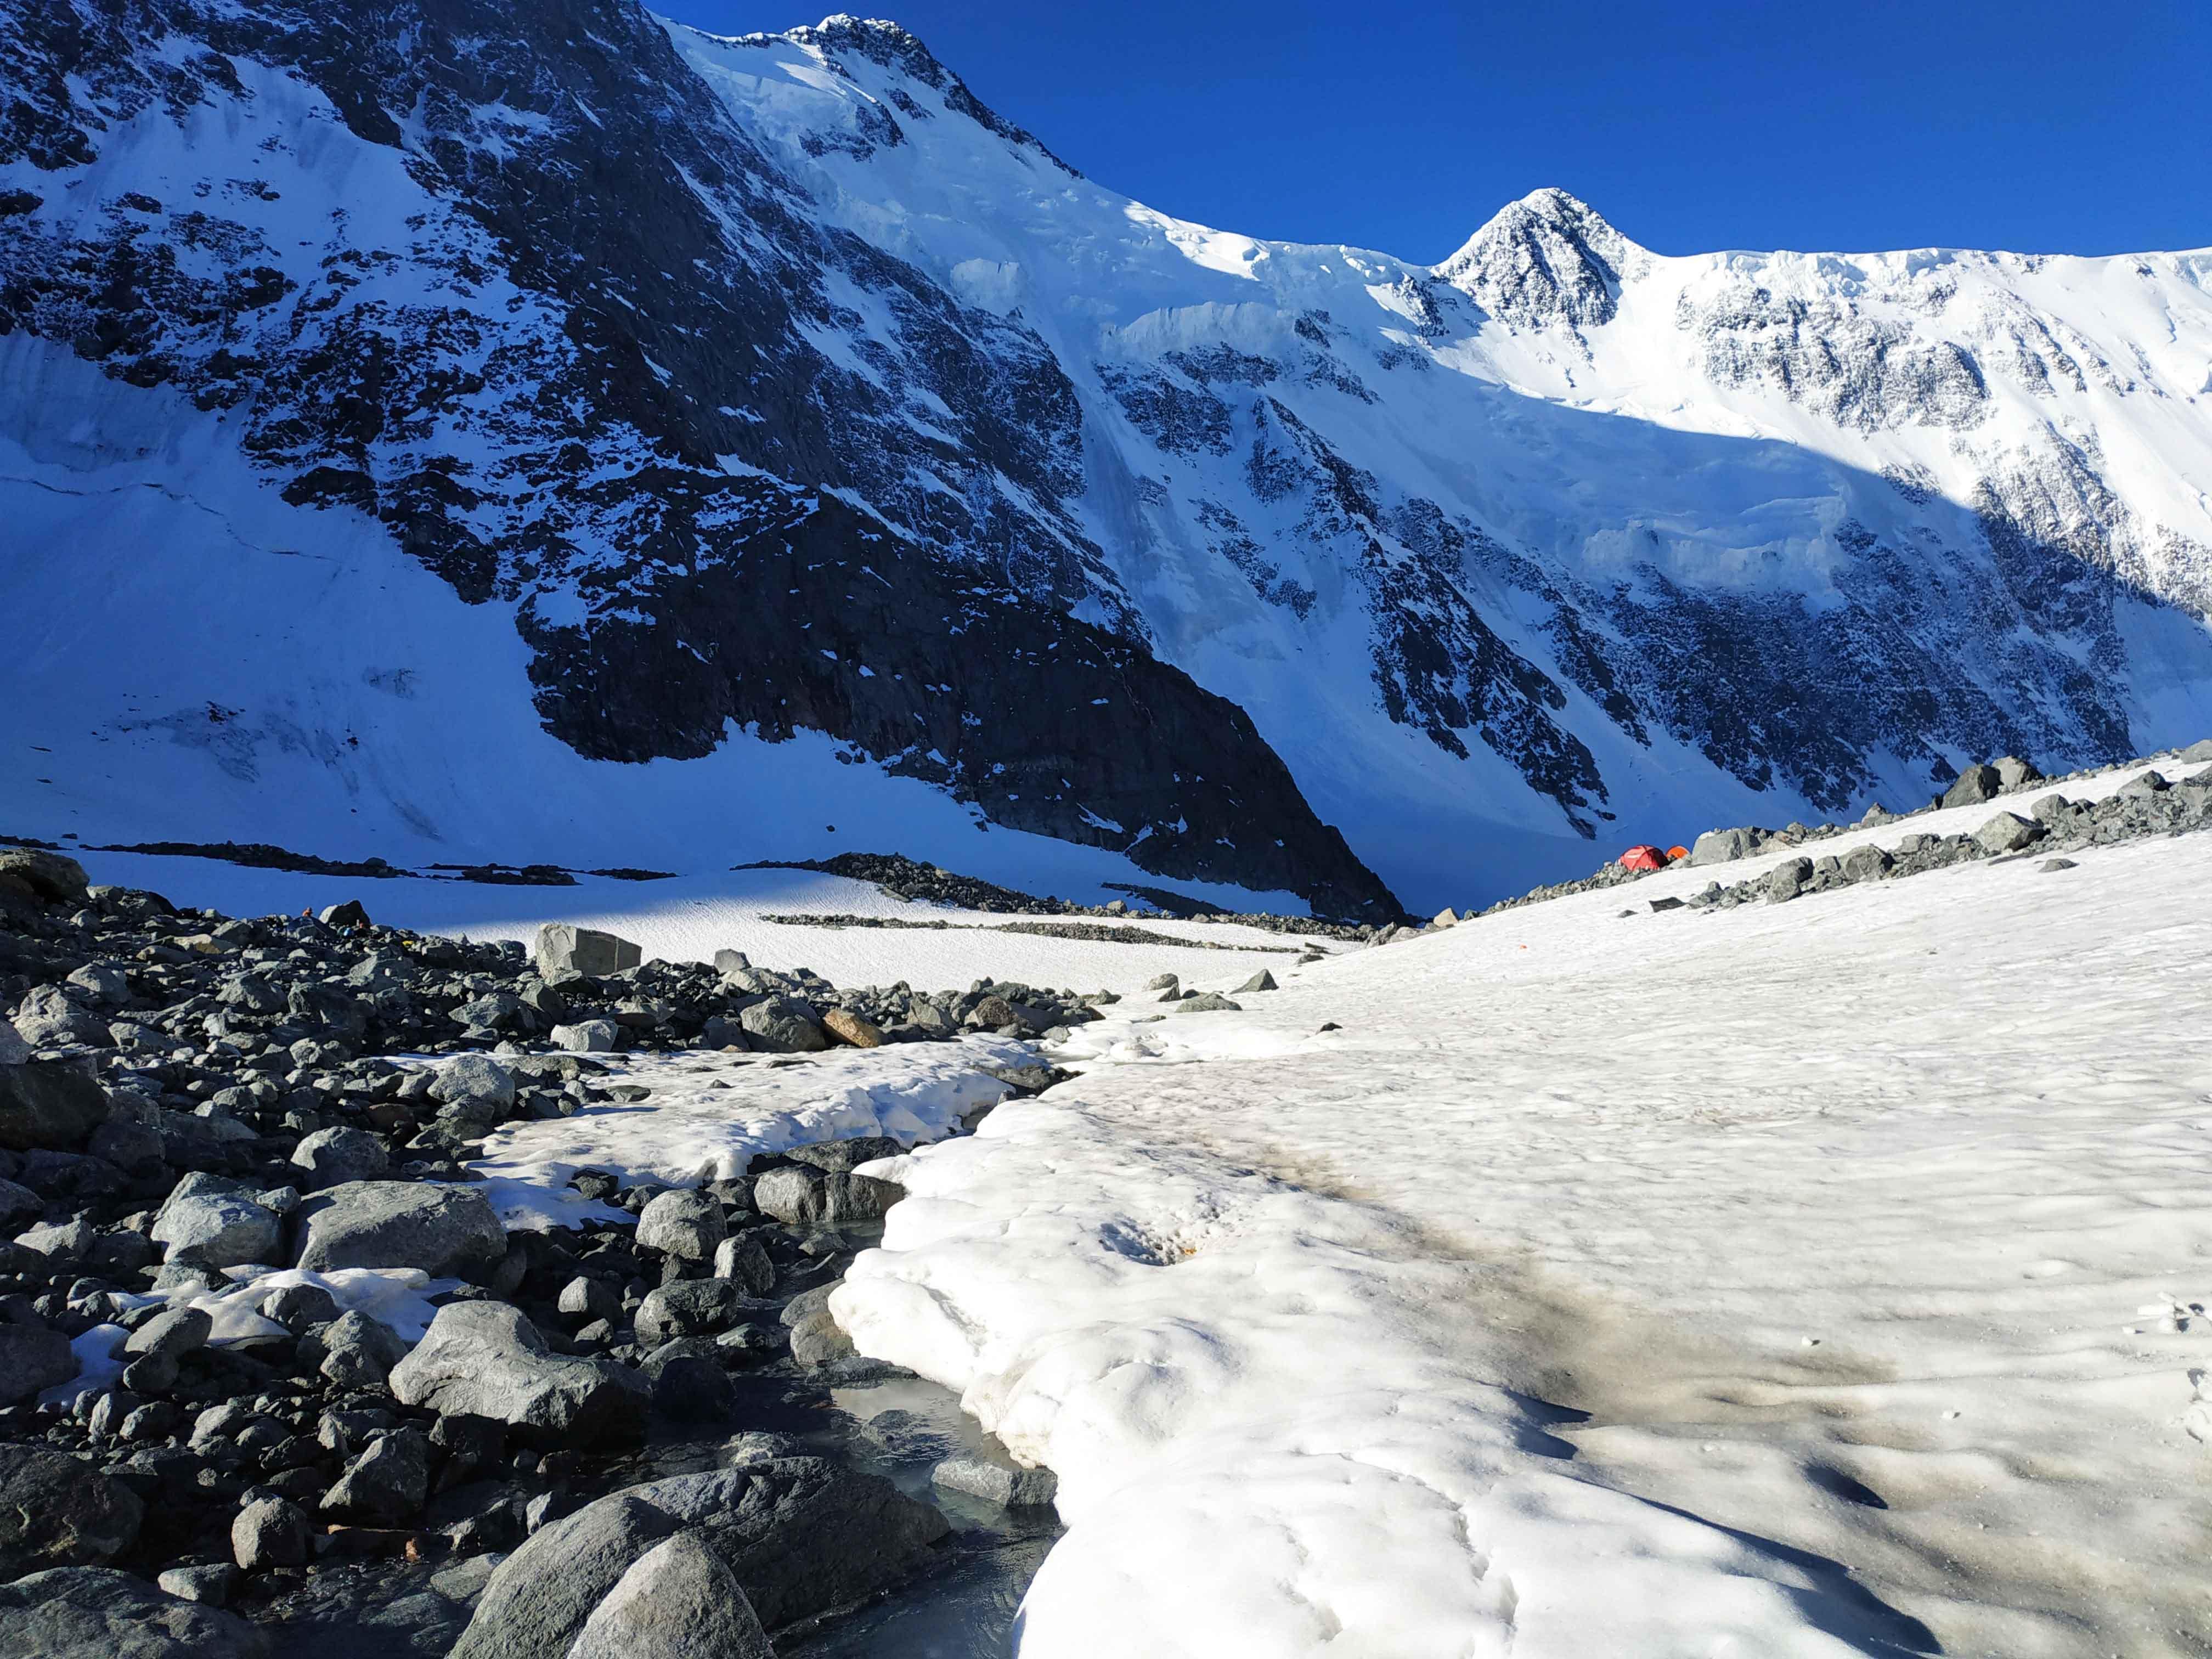 алтай гора белуха фото